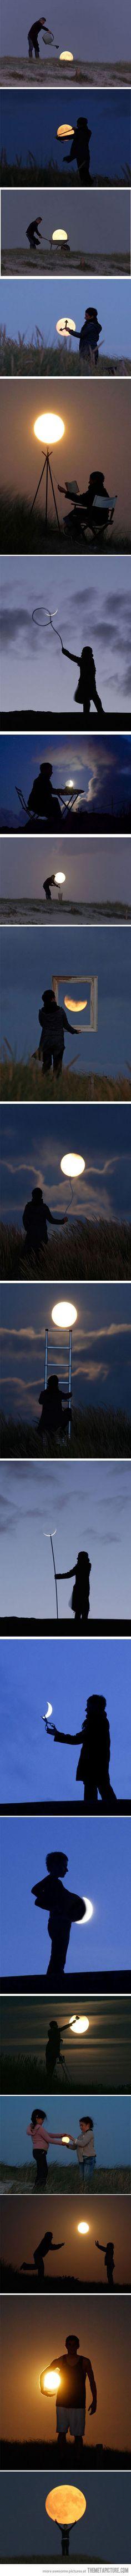 Having fun with the moon…